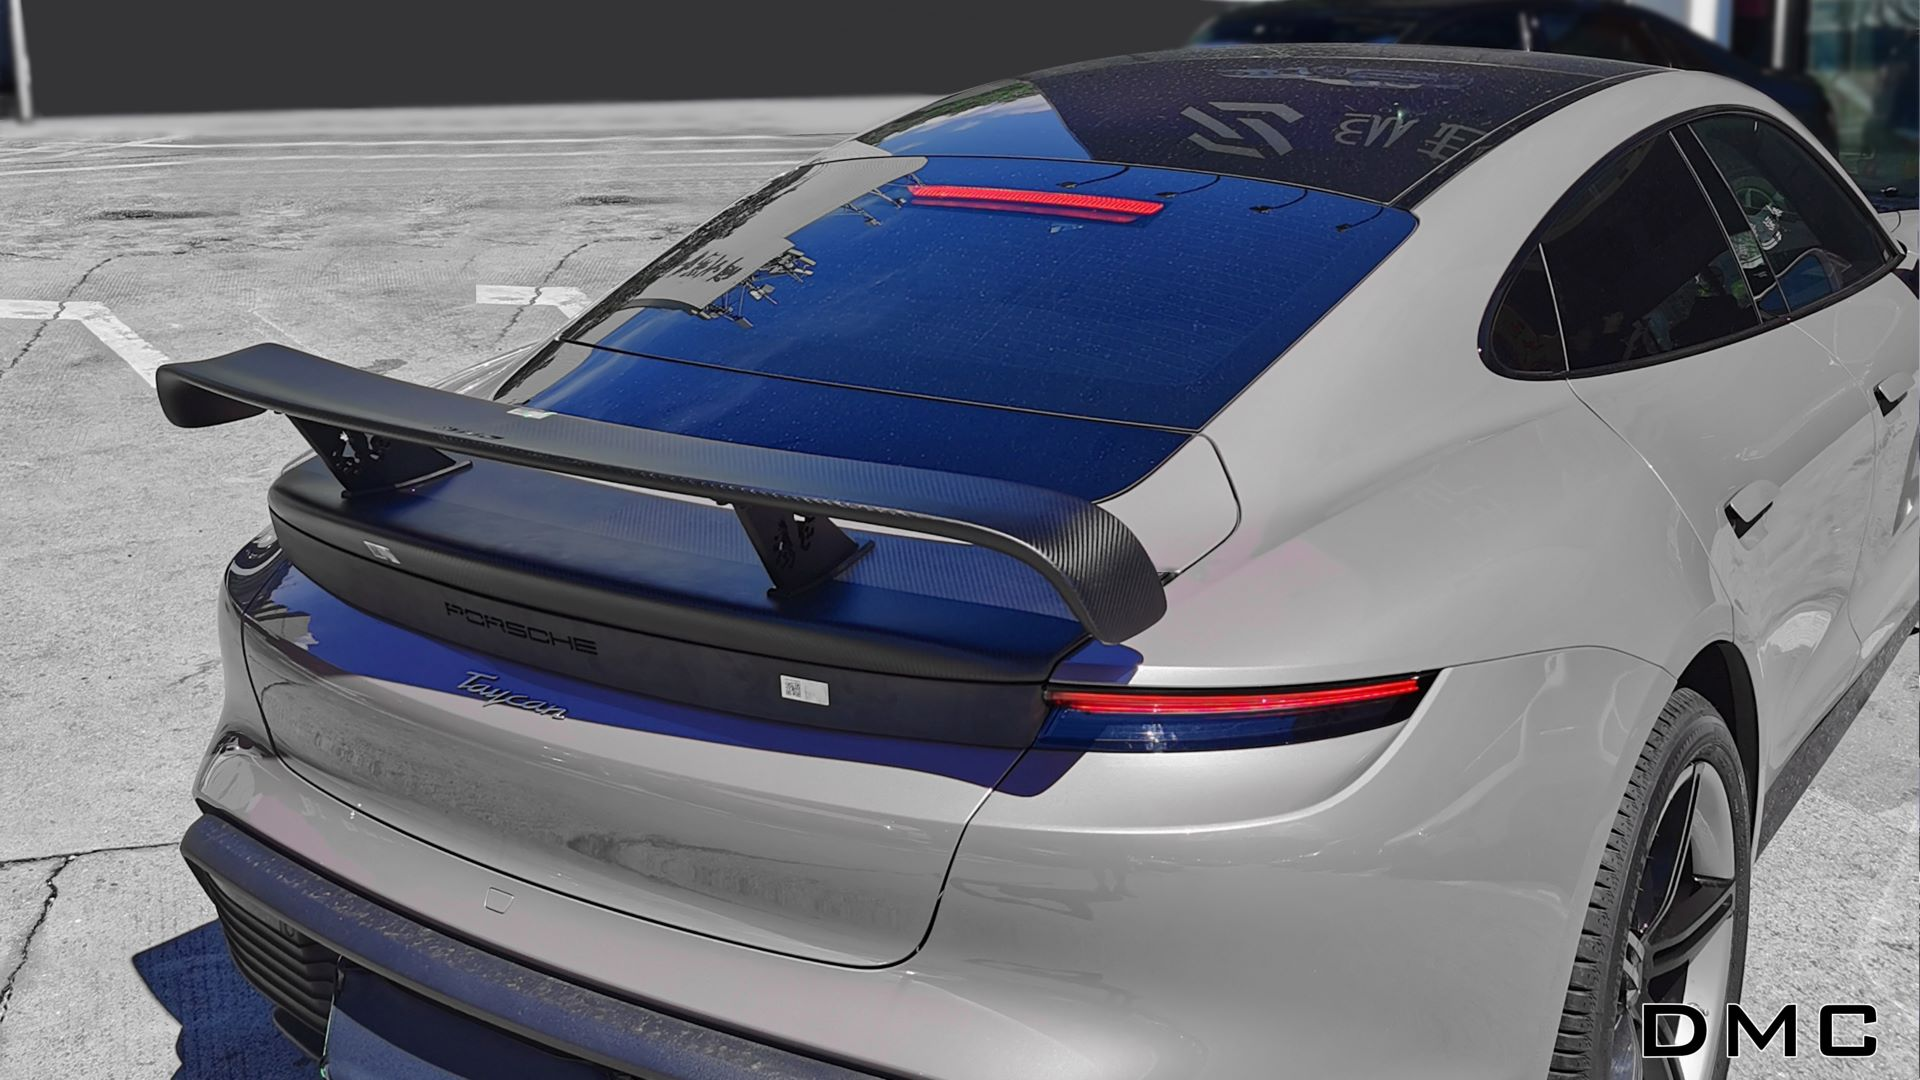 Porsche-Taycan-by-DMC-4